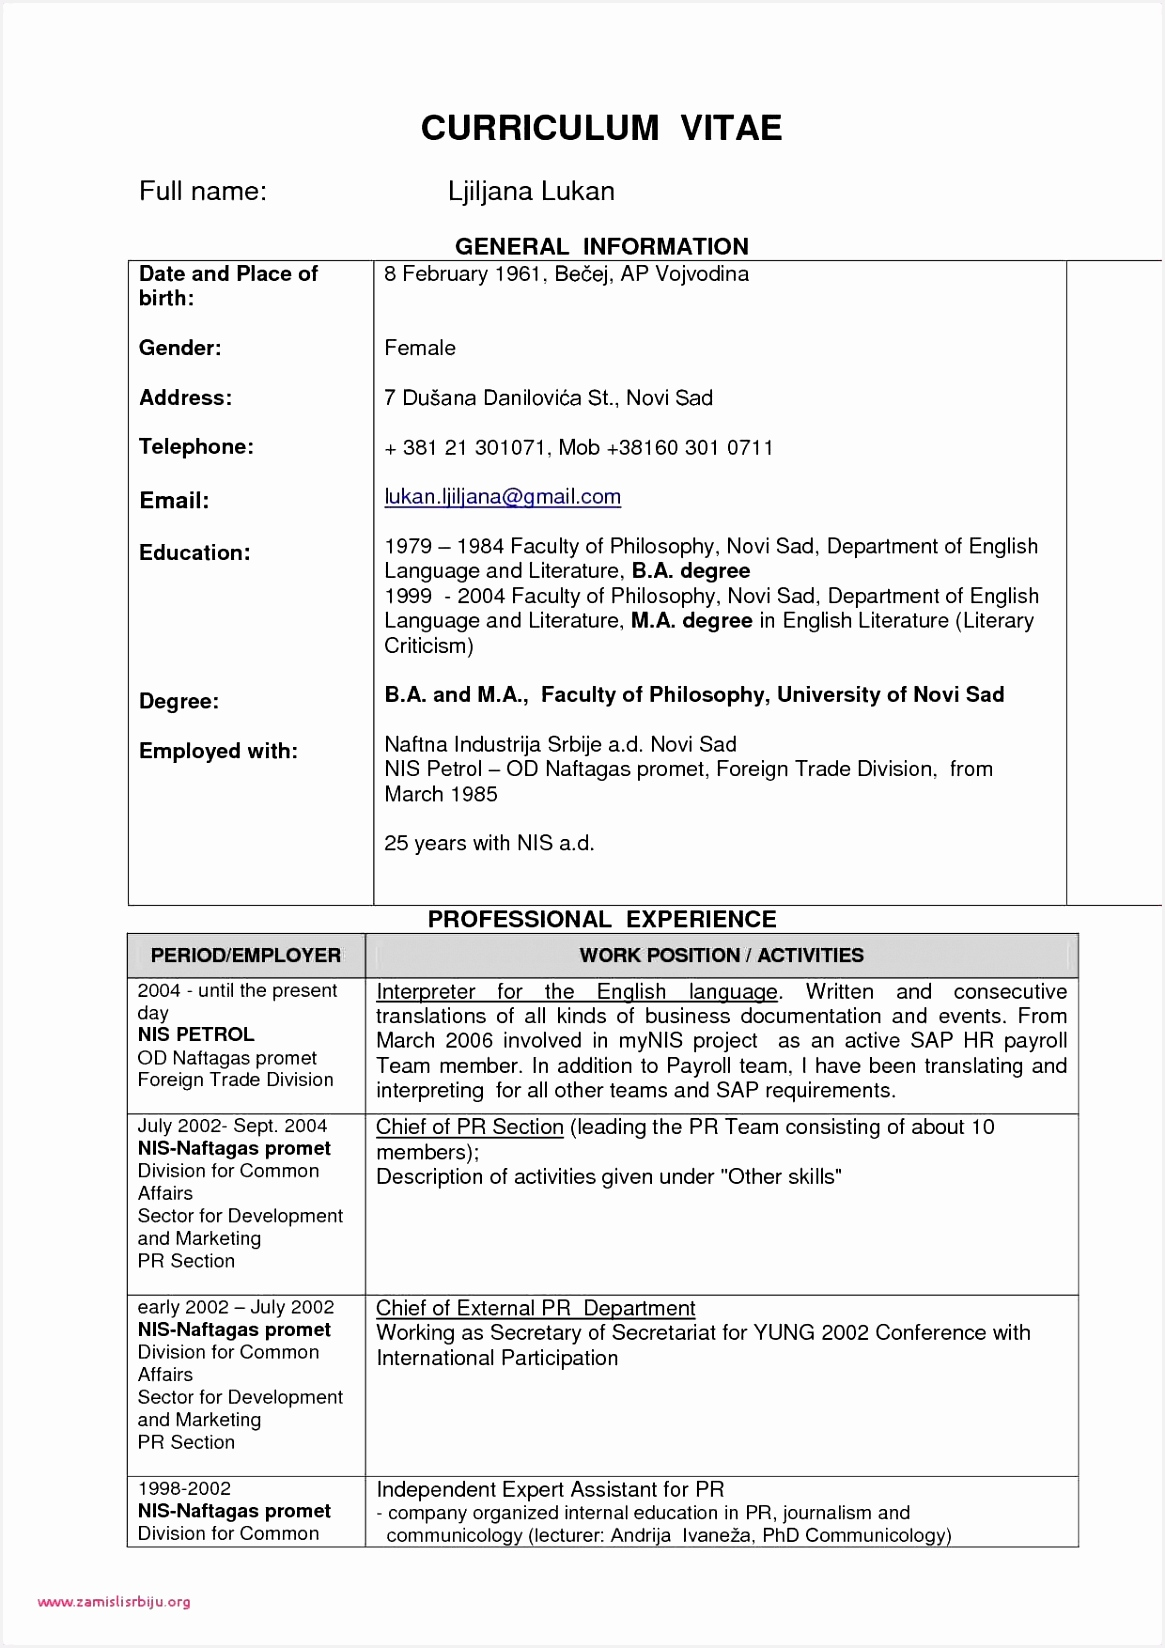 Medical Design Engineer Sample Resume Sample Resume format for Experienced Mechanical Engineer Bire 16481165disbo